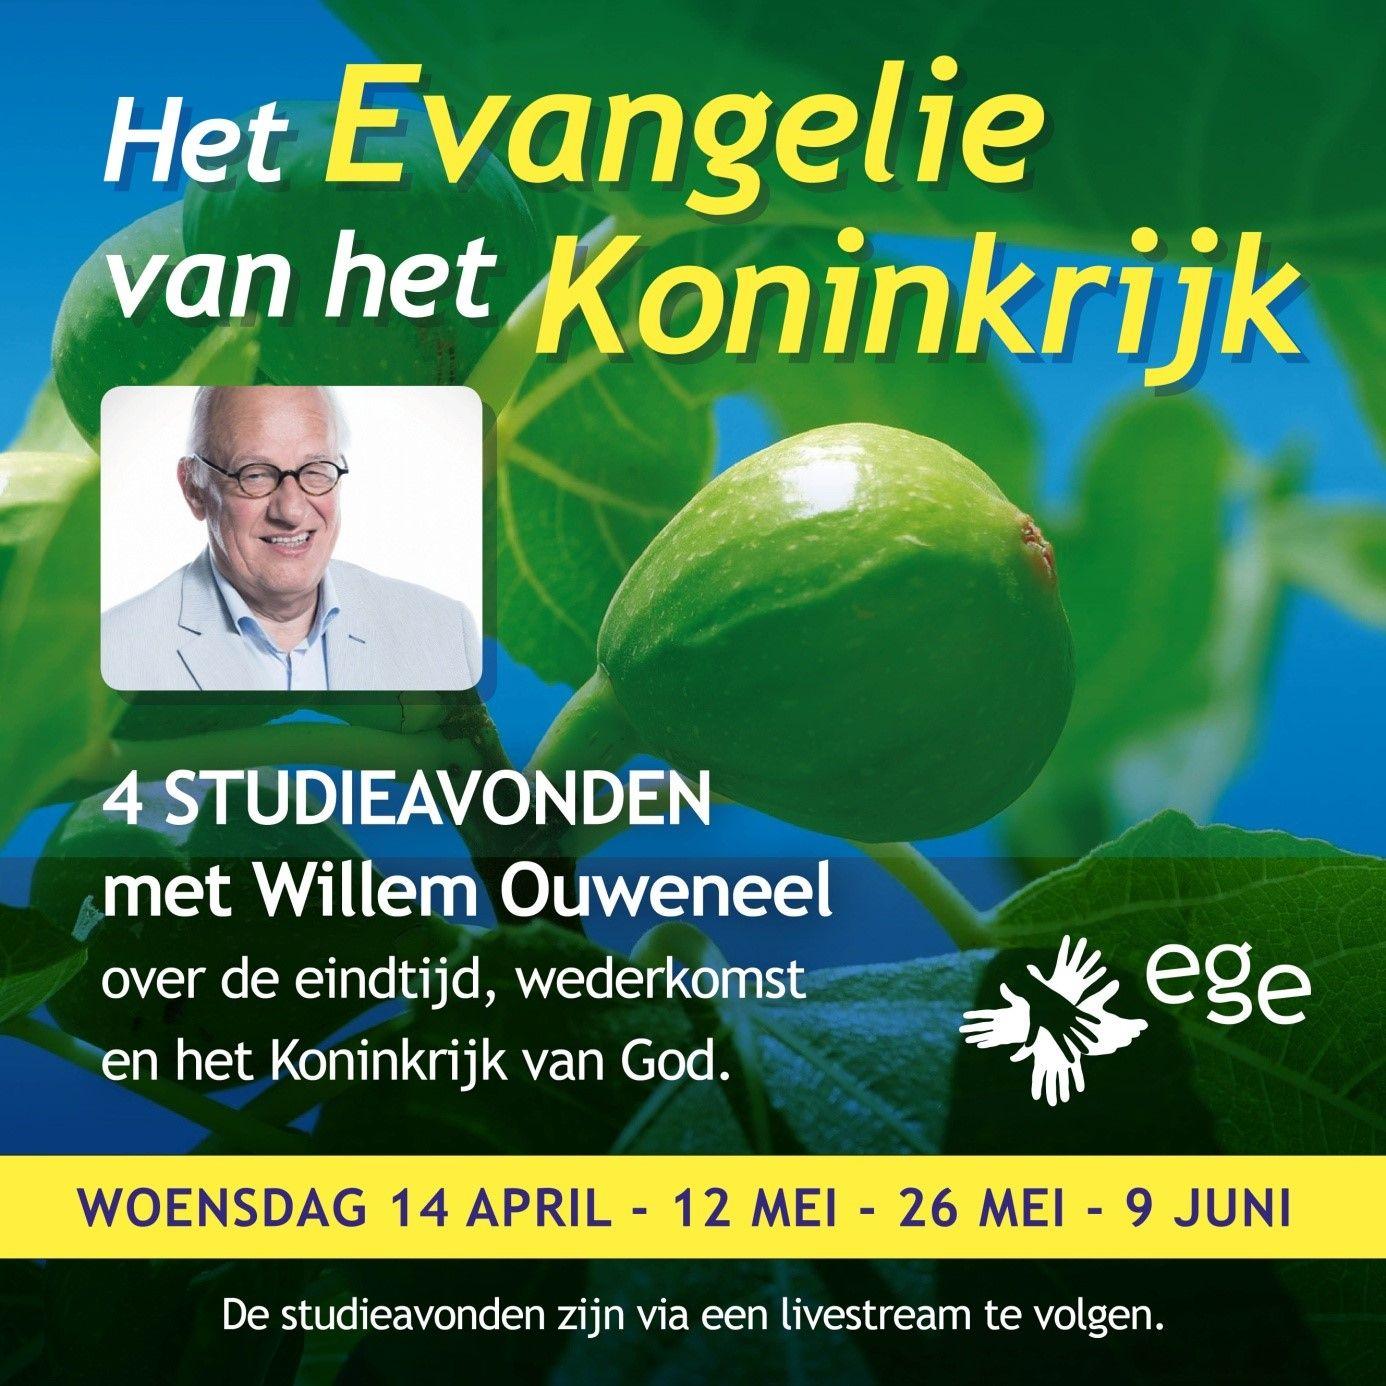 Woensdag 14 april om 19:45 1e studieavond met Willem Ouweneel